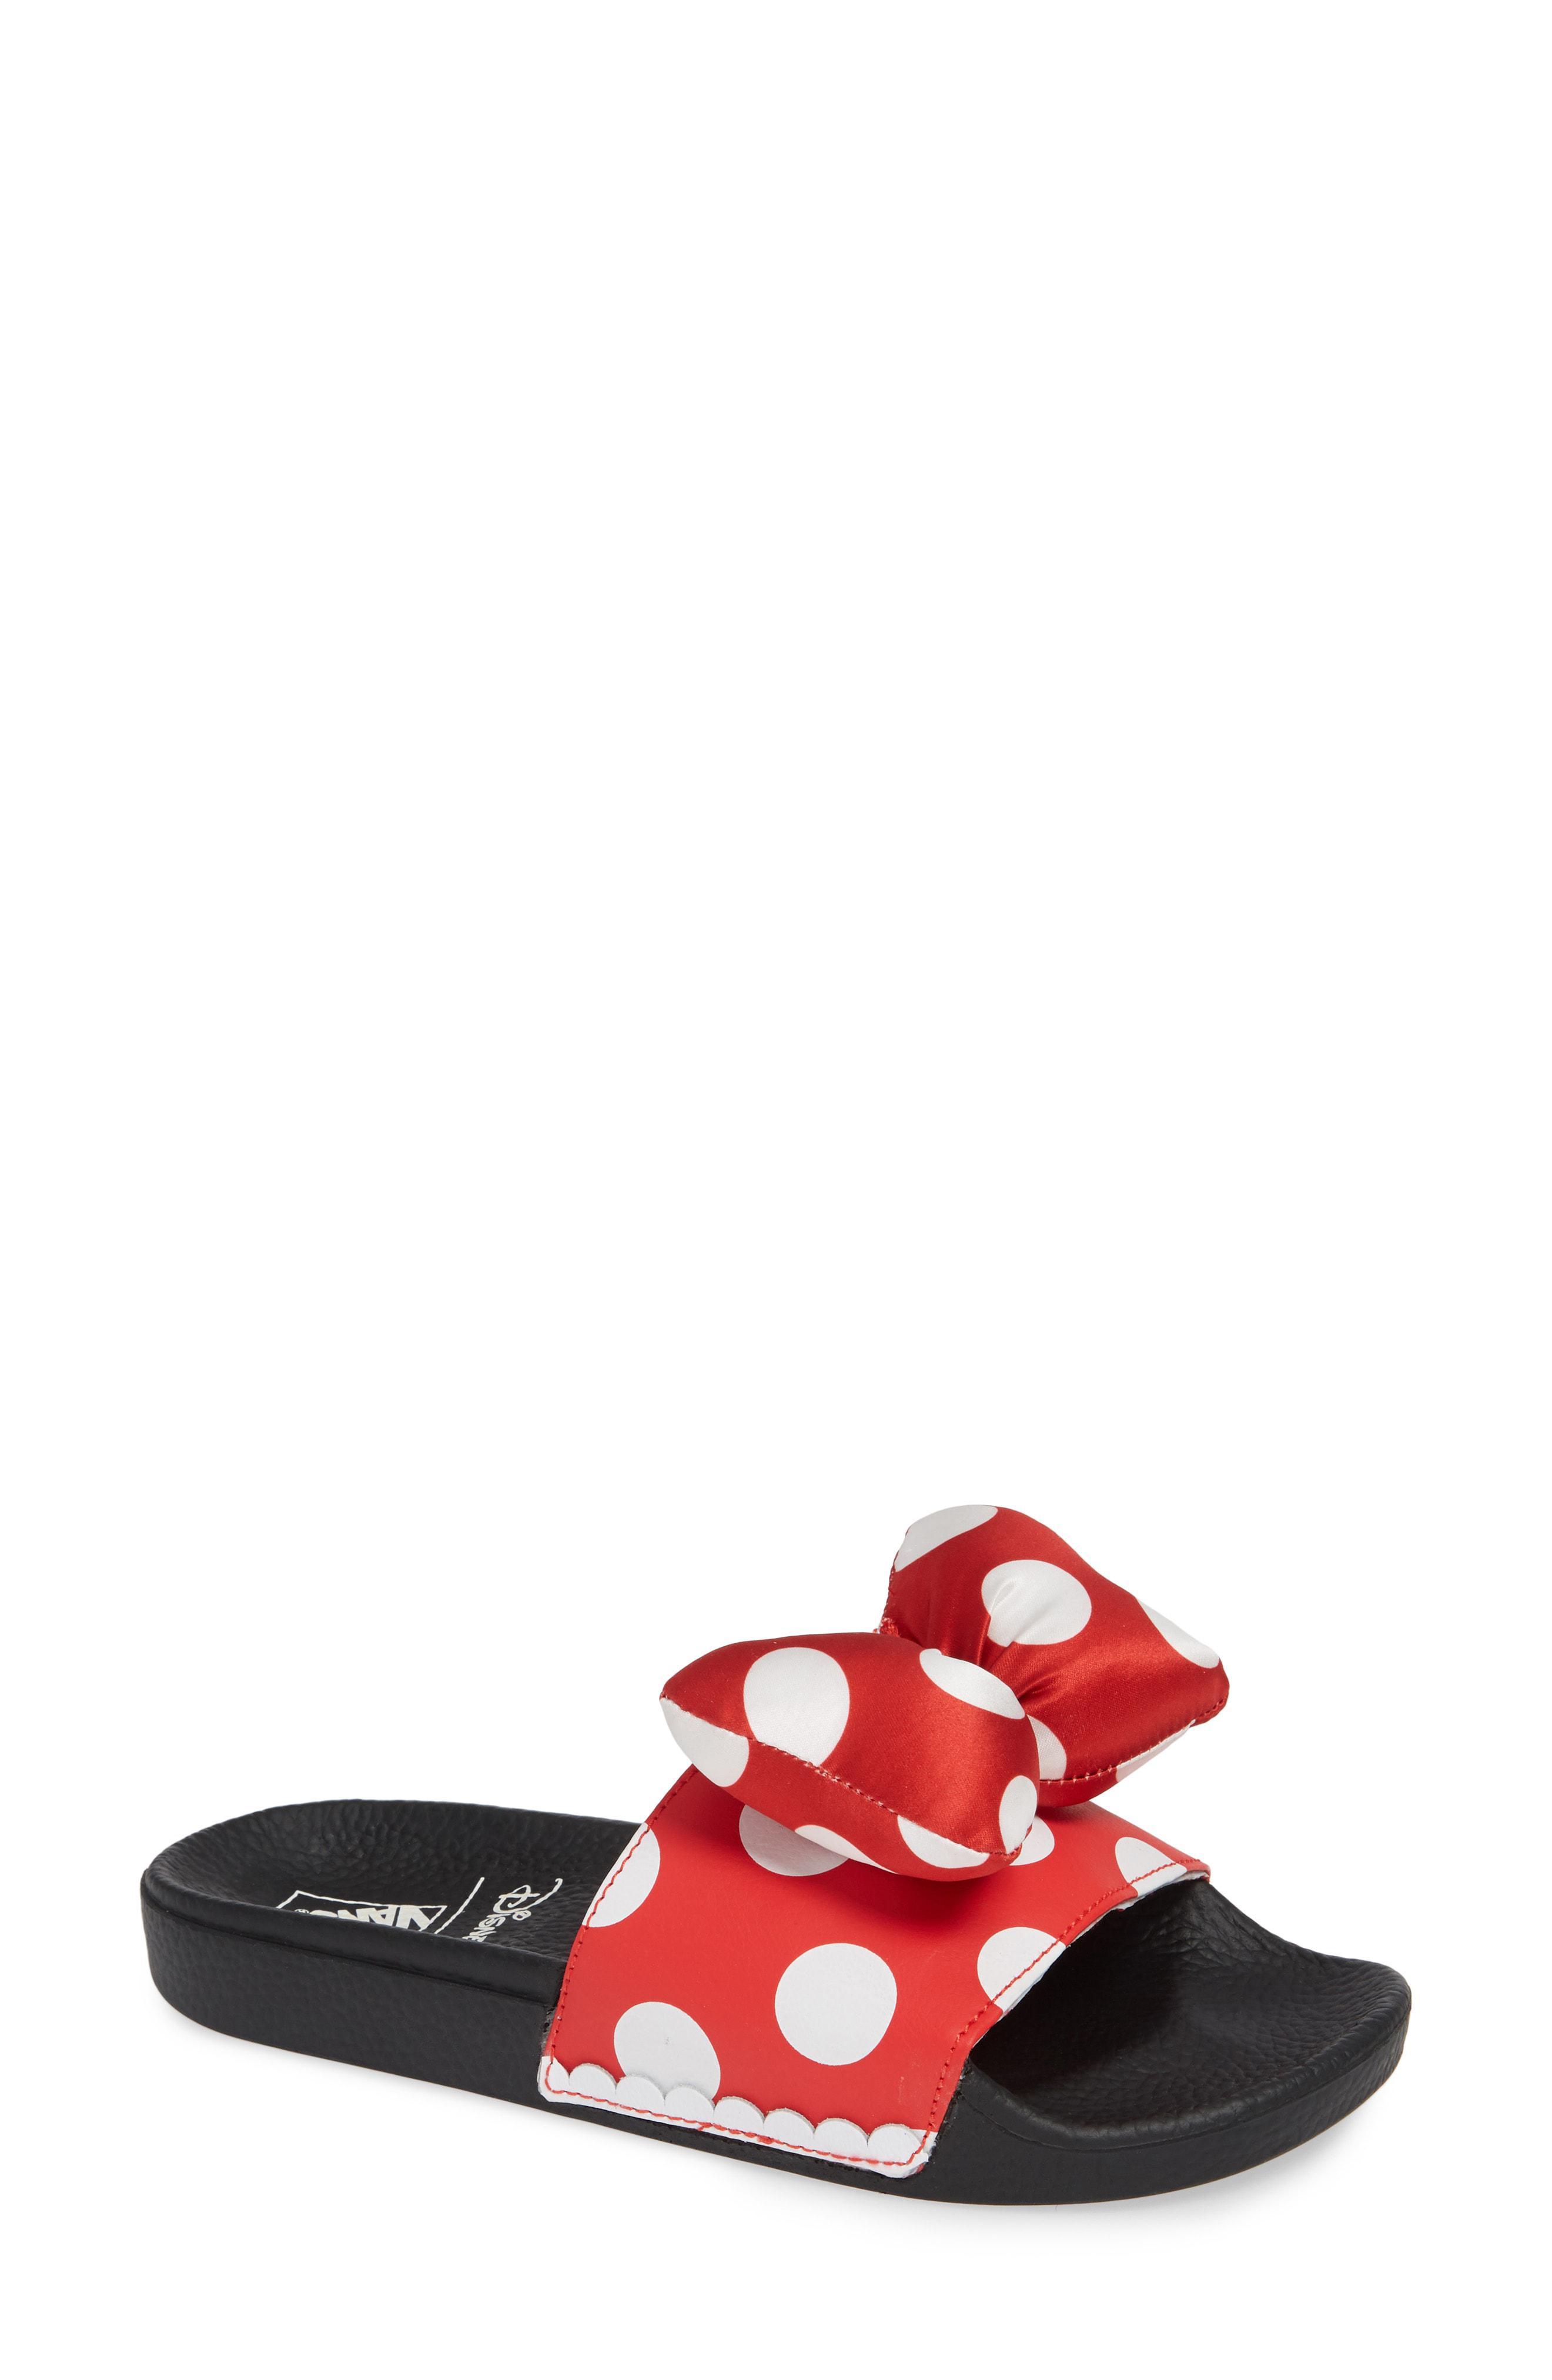 d7c025f93df5 Lyst - Vans X Disney Minnie Mouse Slide Sandal in Red